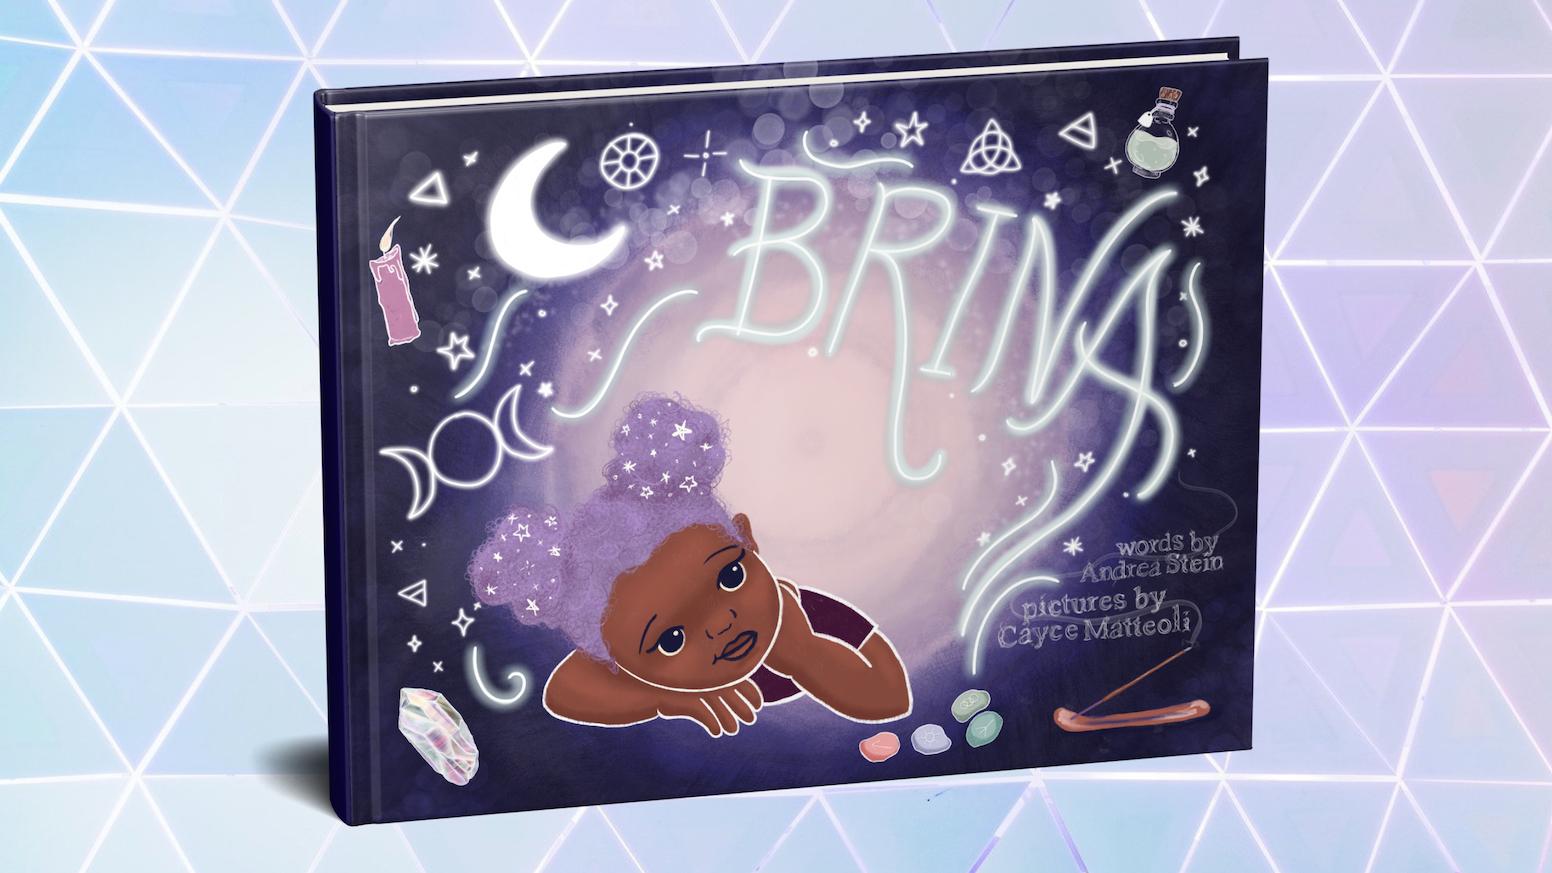 Brina: A Pagan Picture Book by Andrea Stein — Kickstarter